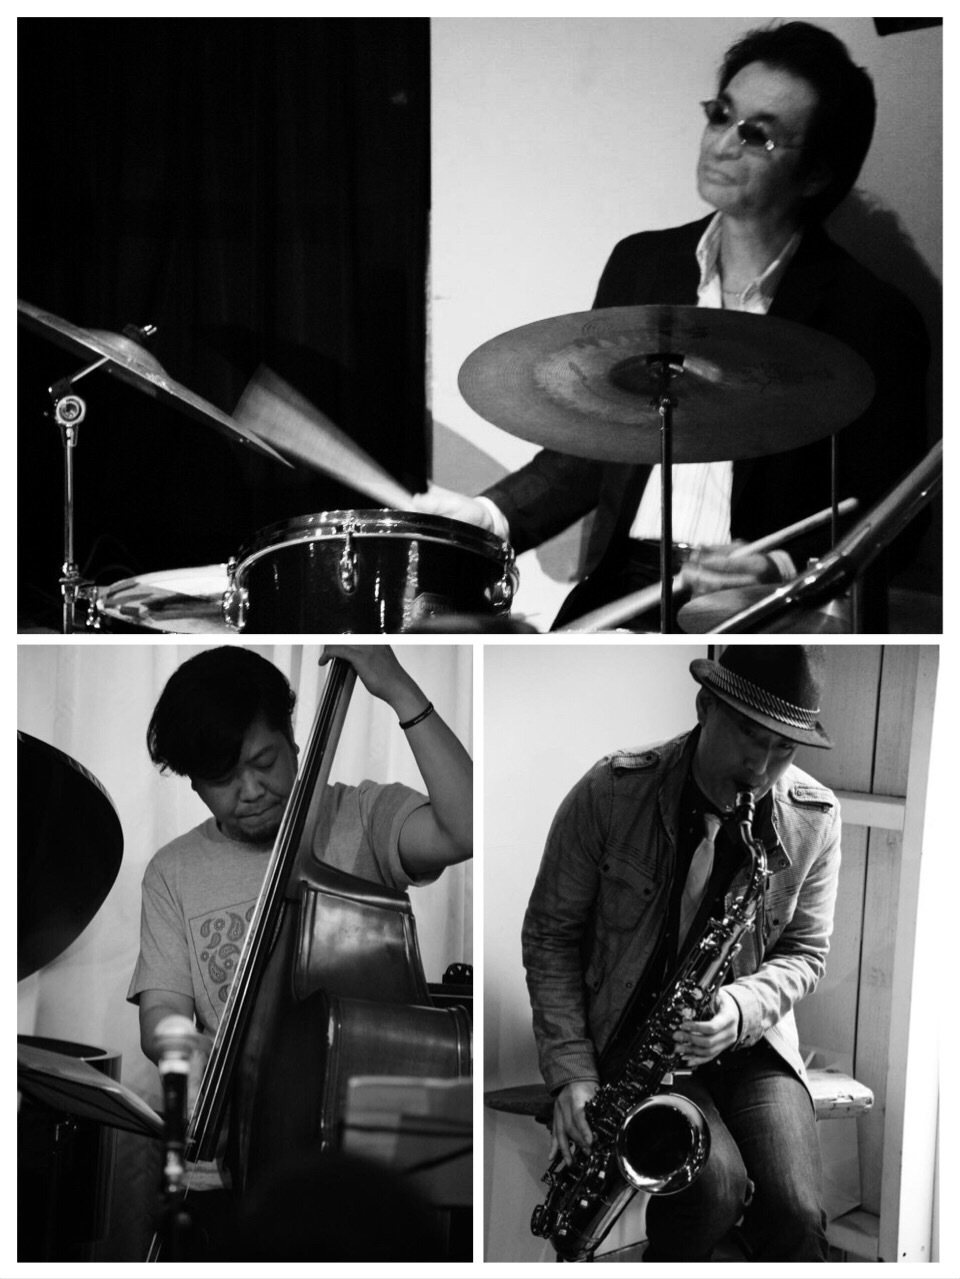 Jazzlive comin 広島 本日29日のライブ_b0115606_12182982.jpeg